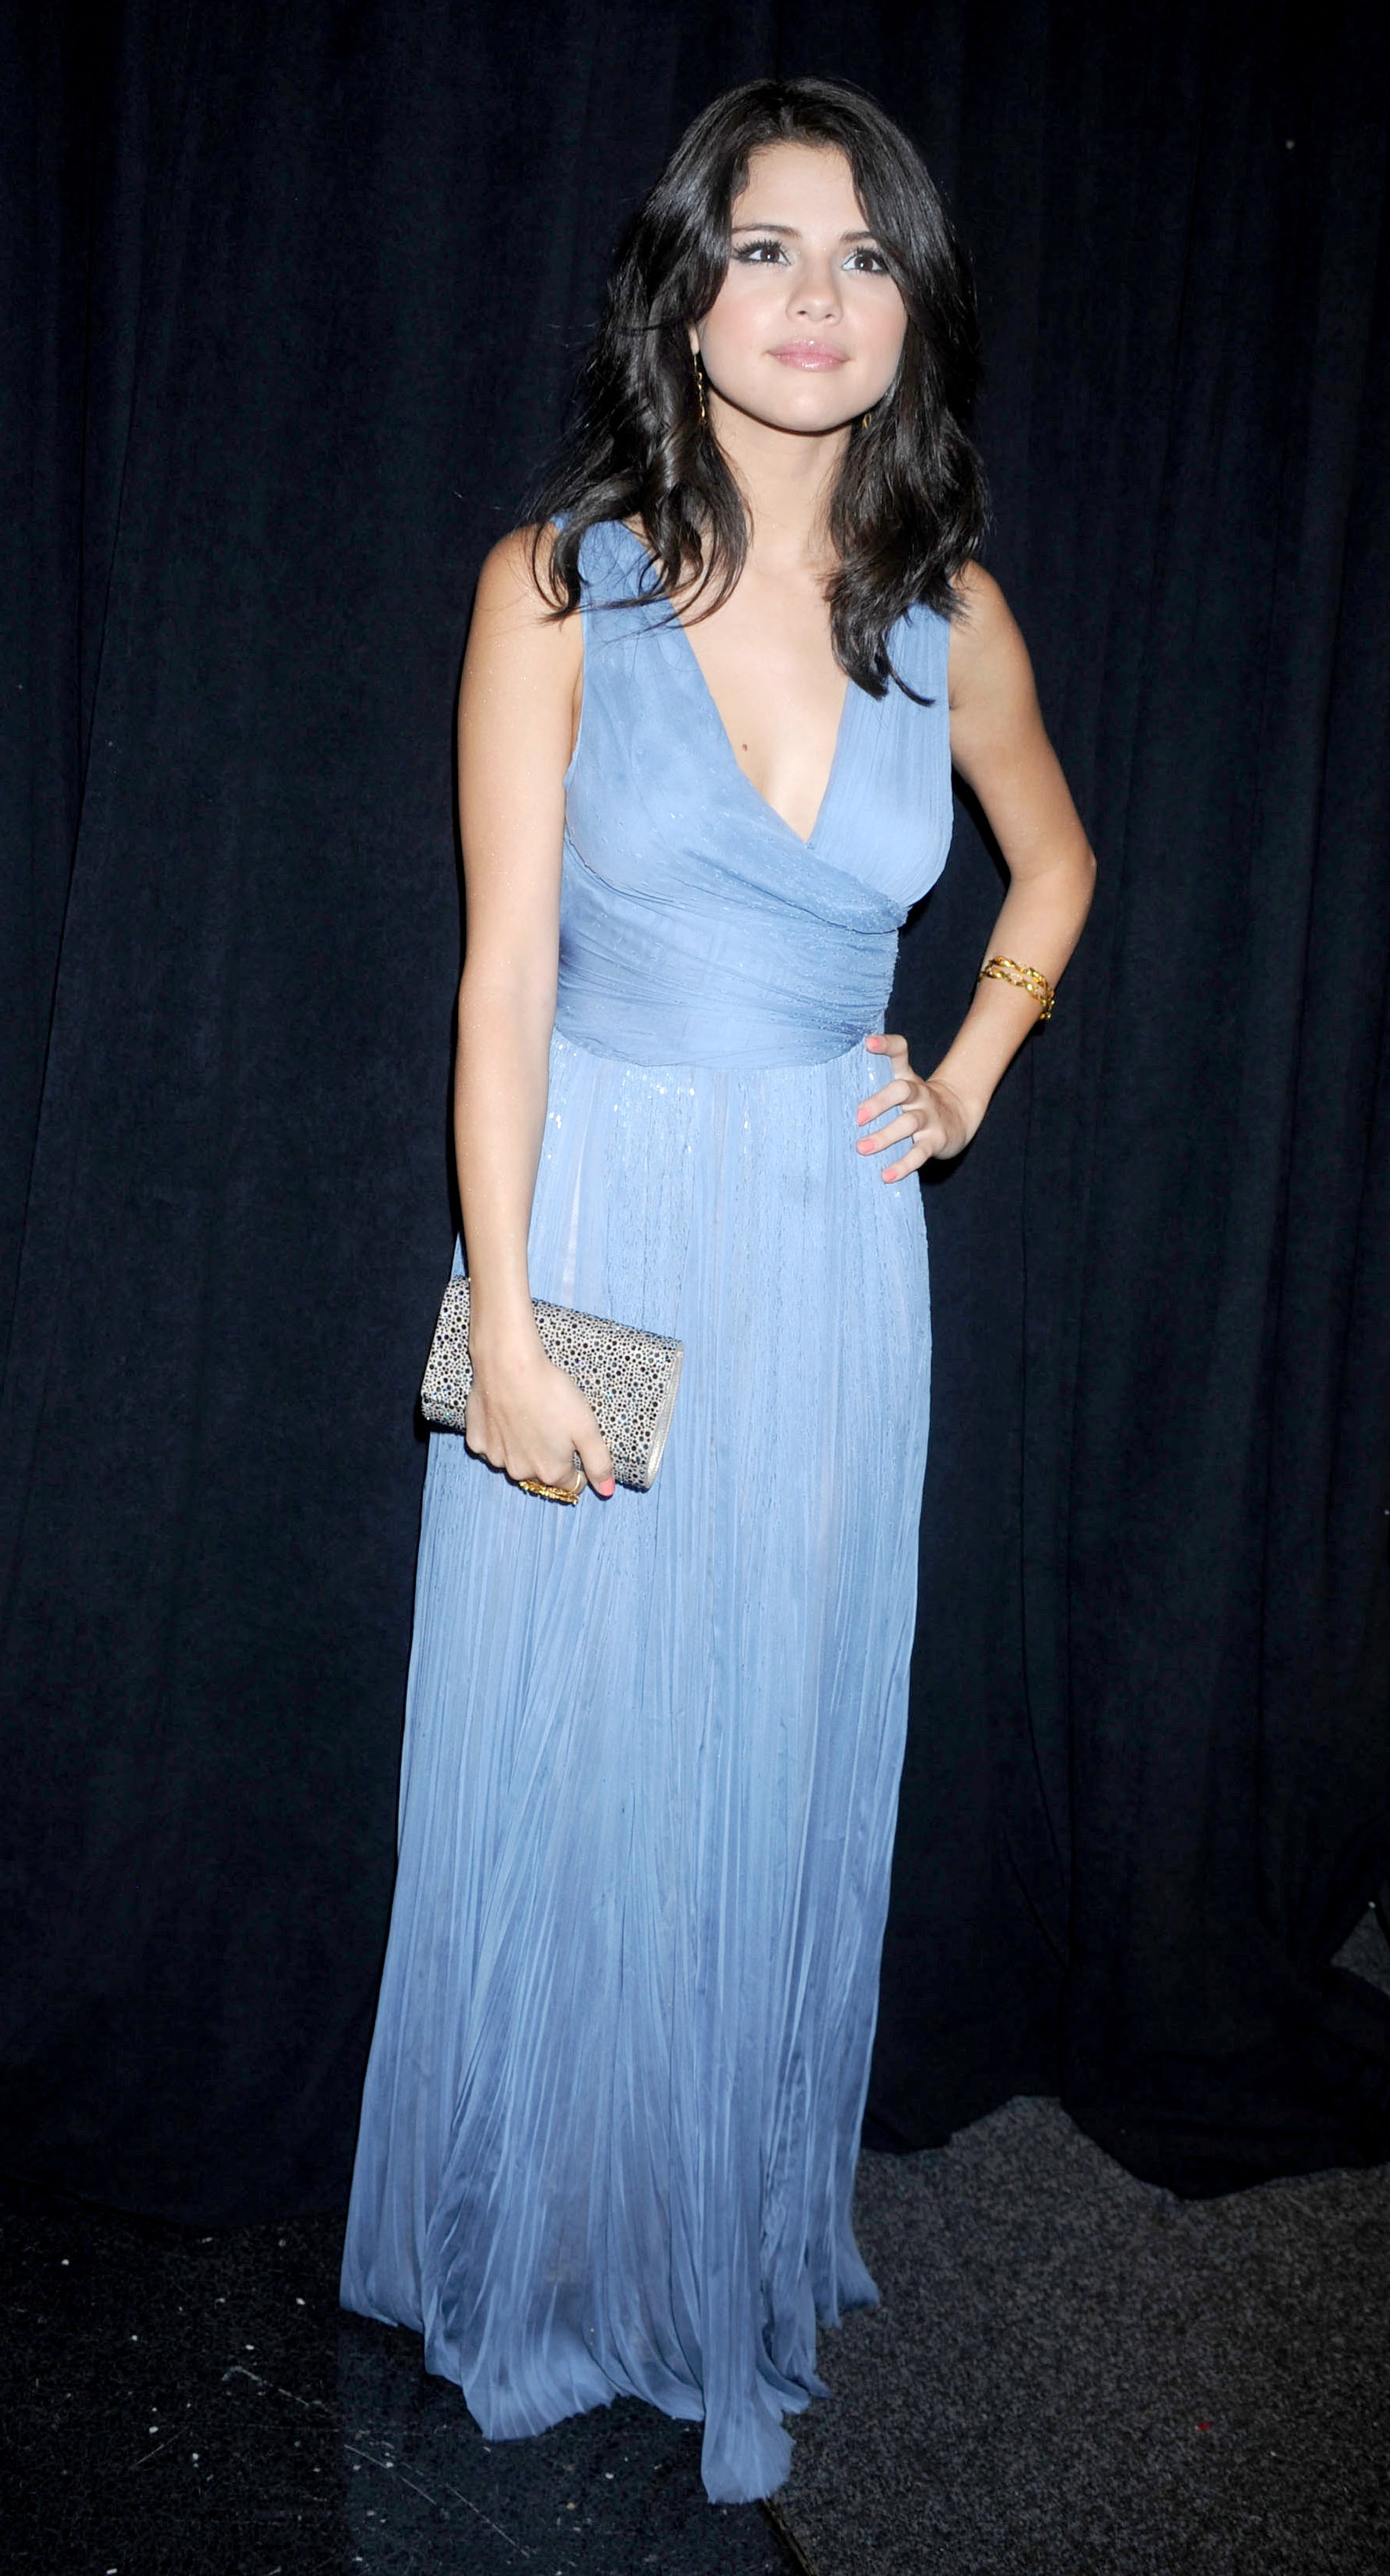 Selena Gomez Monte Carlo NYC J 0001 178 (Selena_Gomez ...